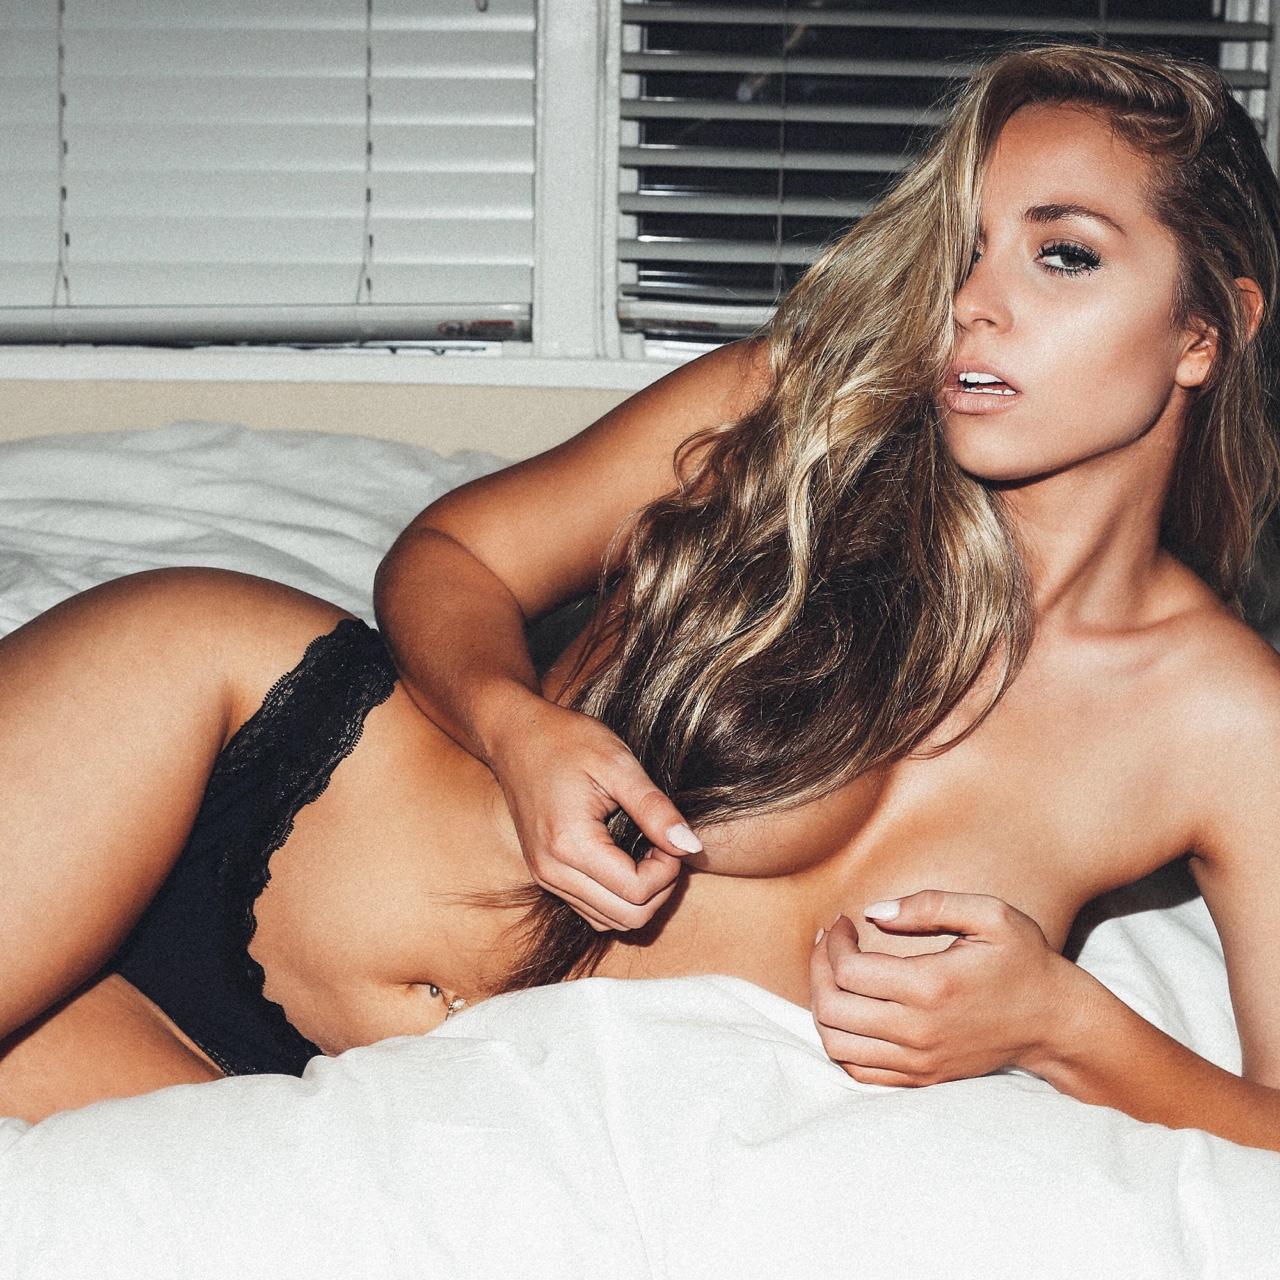 eskort sara sex bondage